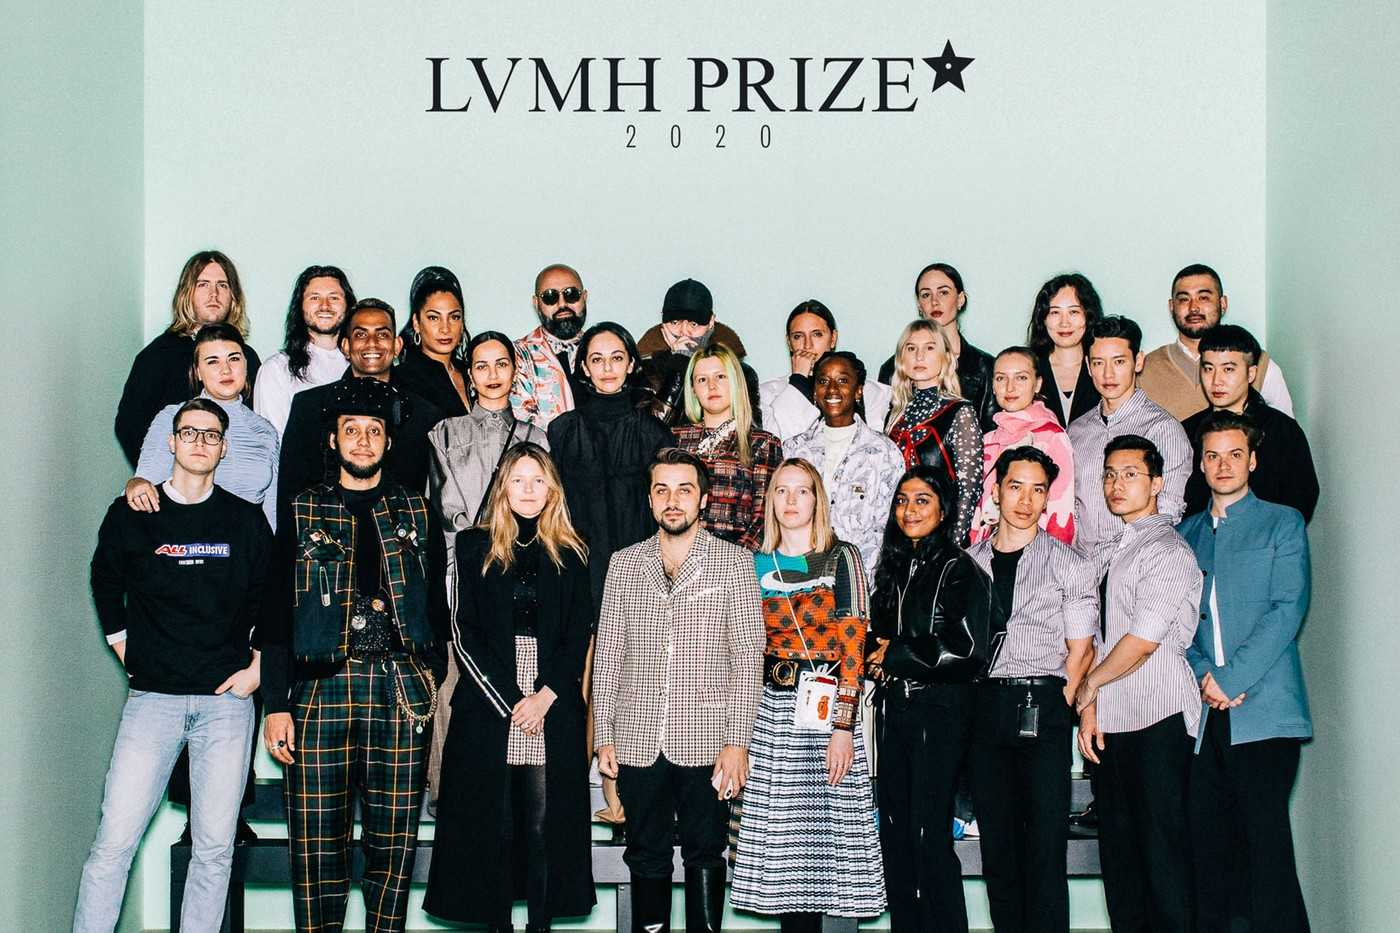 LVMH Prize 2020